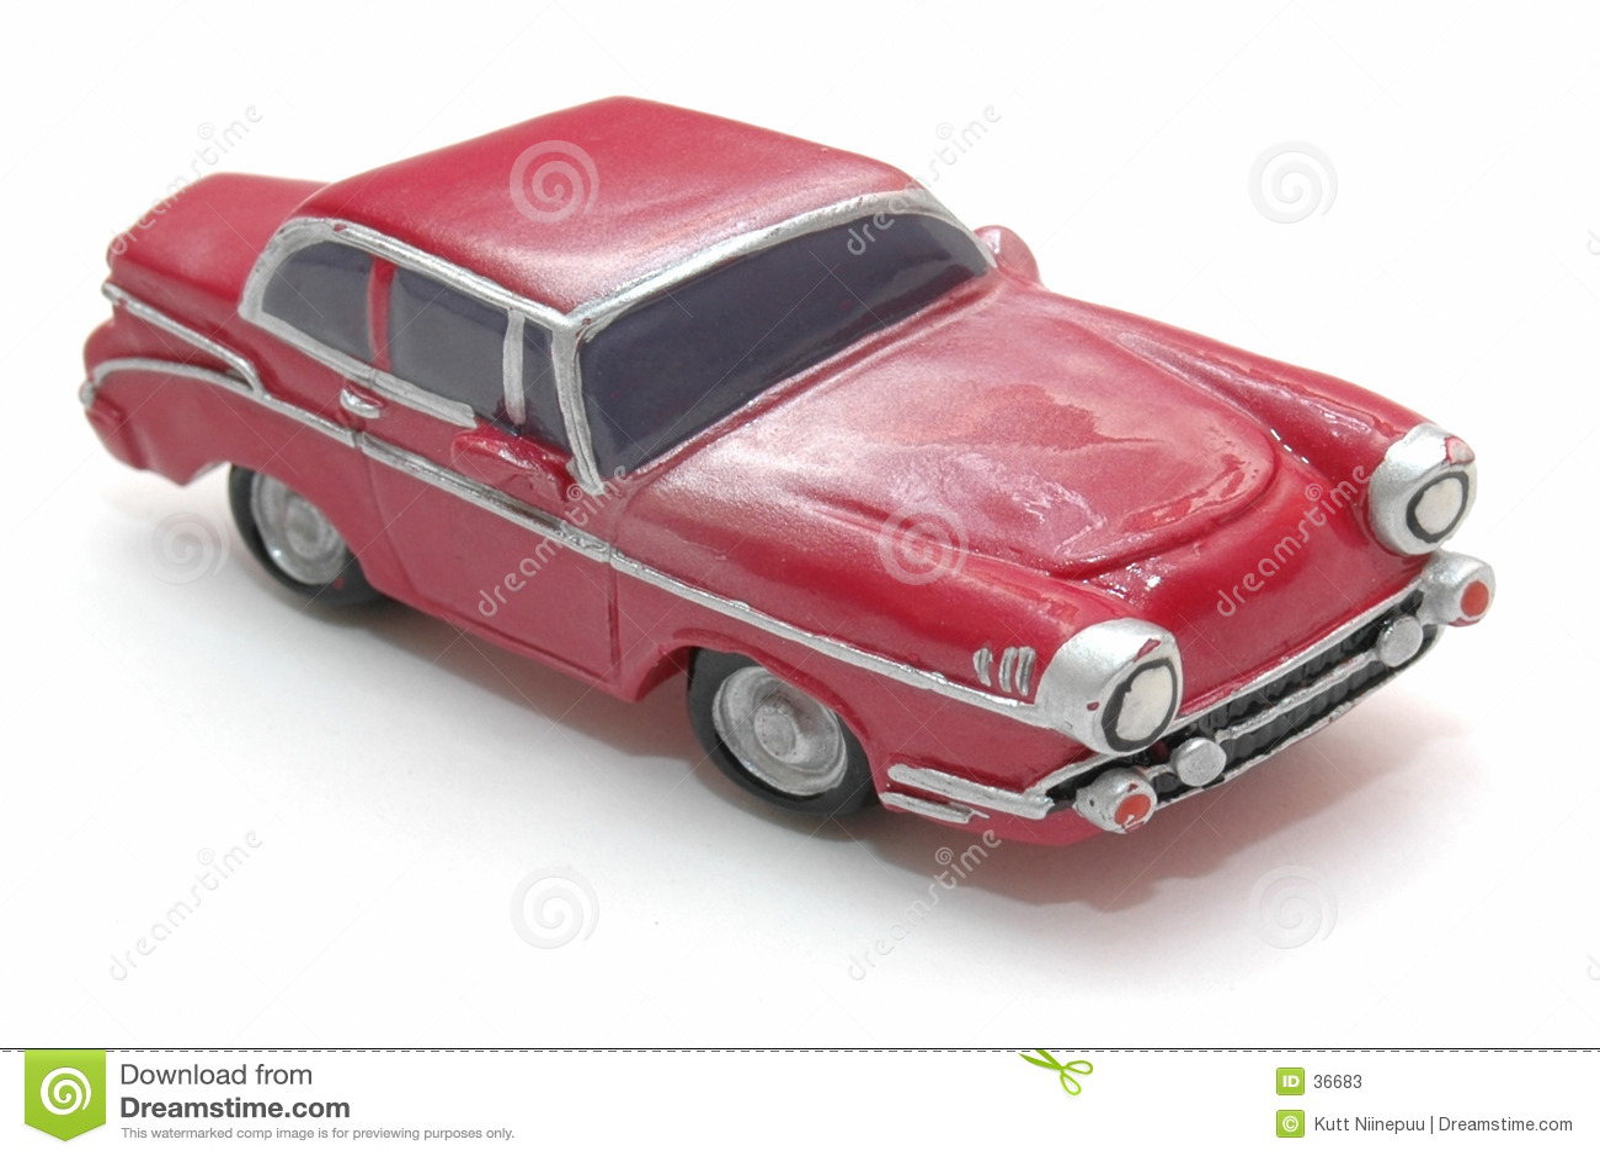 1个汽车玩具